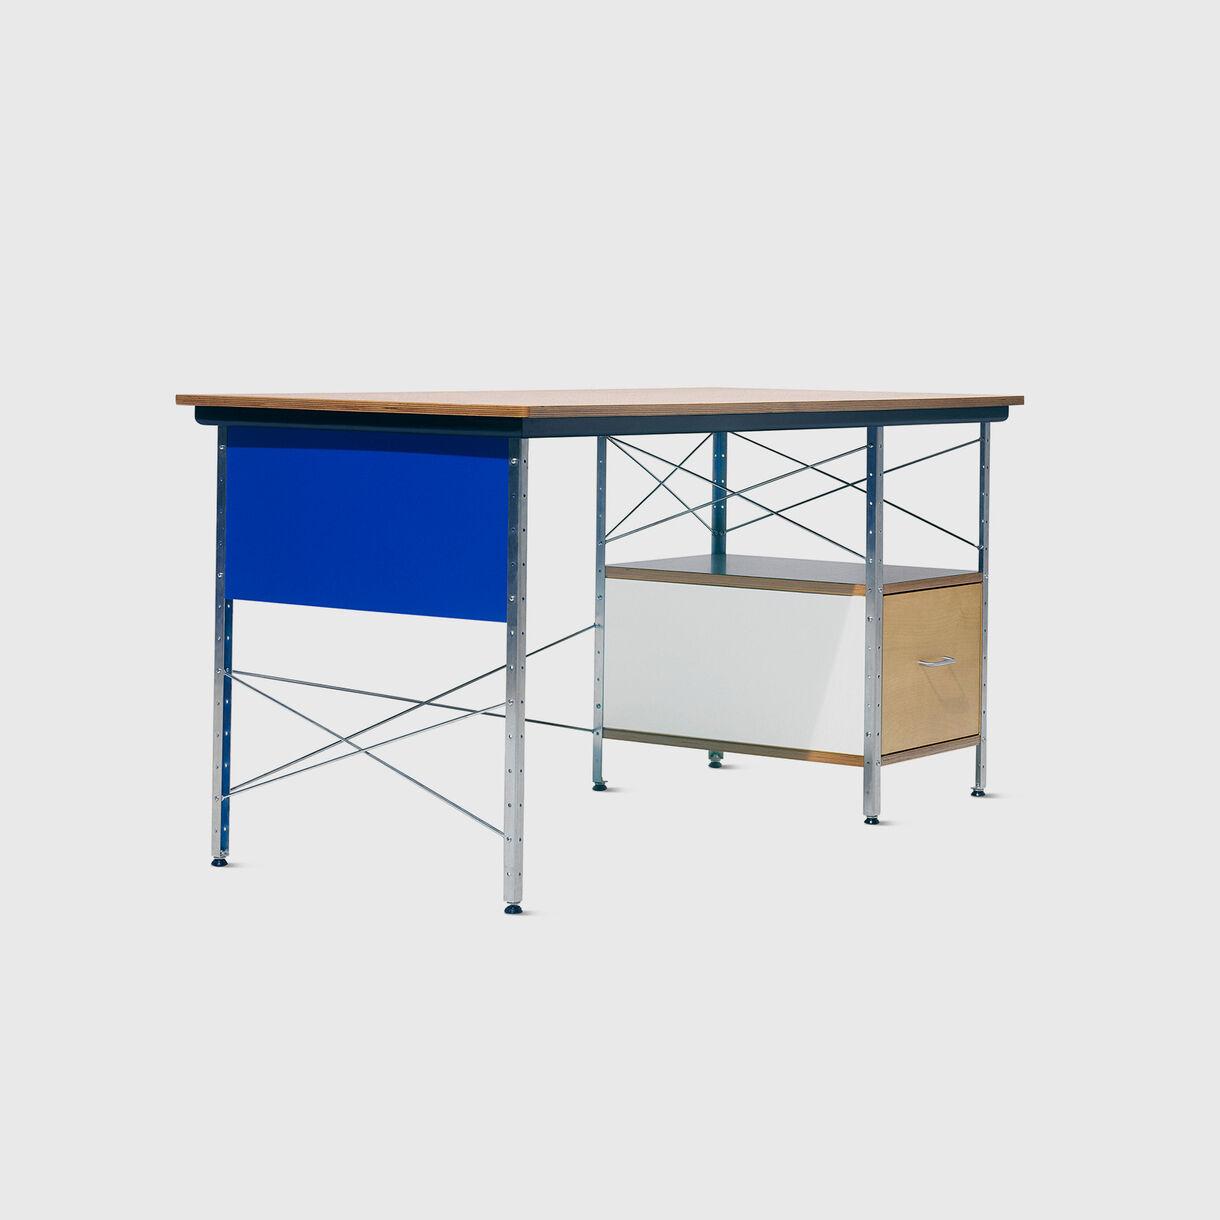 Eames Desk Unit, RH File Drawer